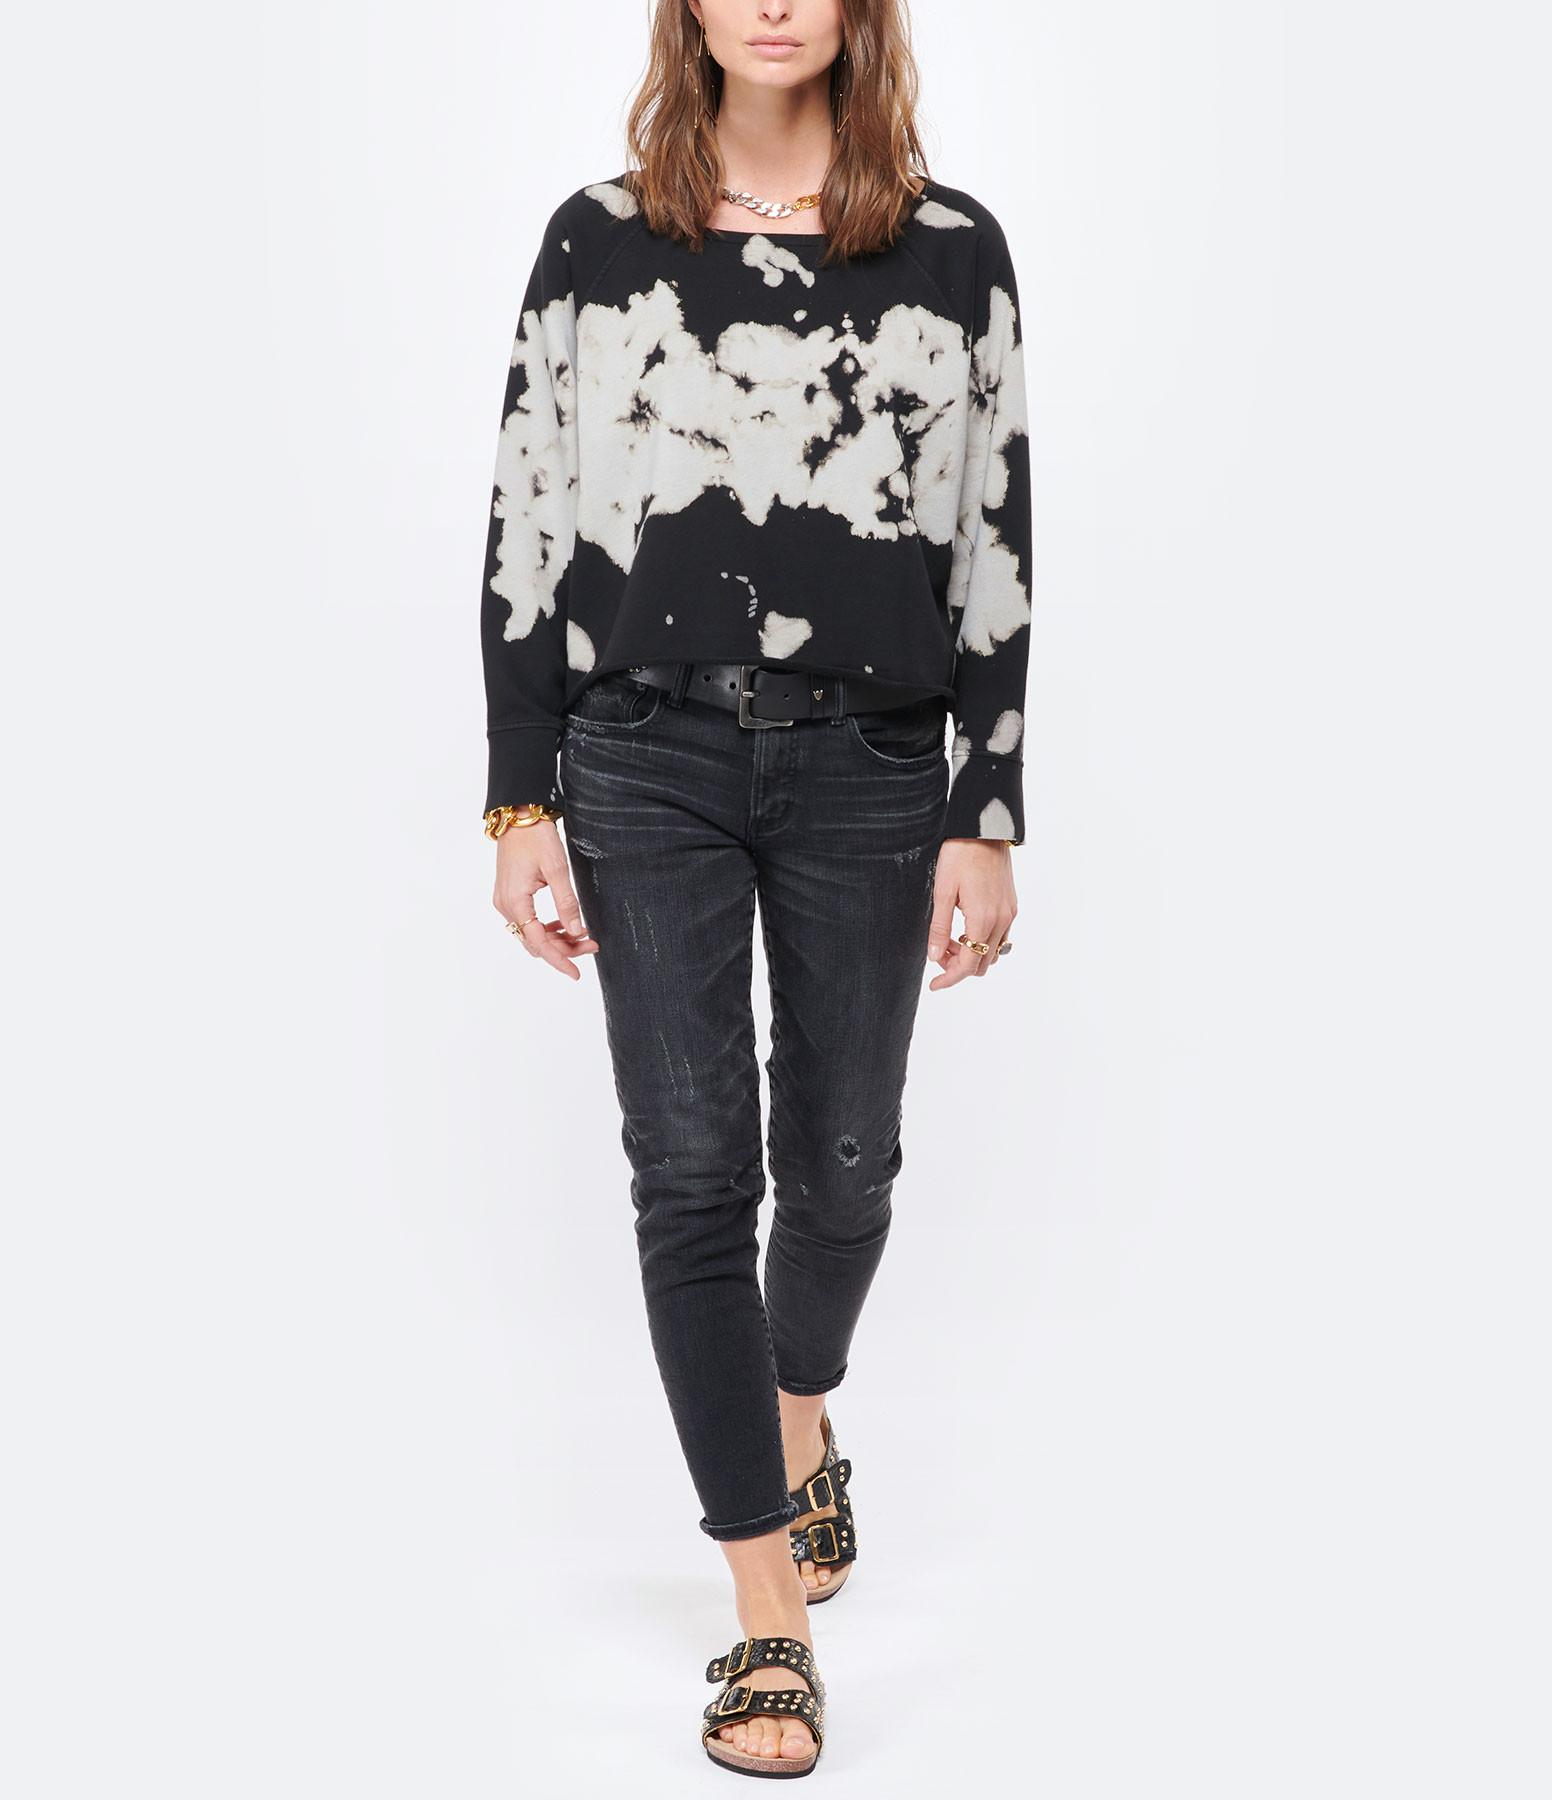 JEANNE VOULAND - Sweatshirt Faly Crop Coton Tie and Dye Noir Blanc